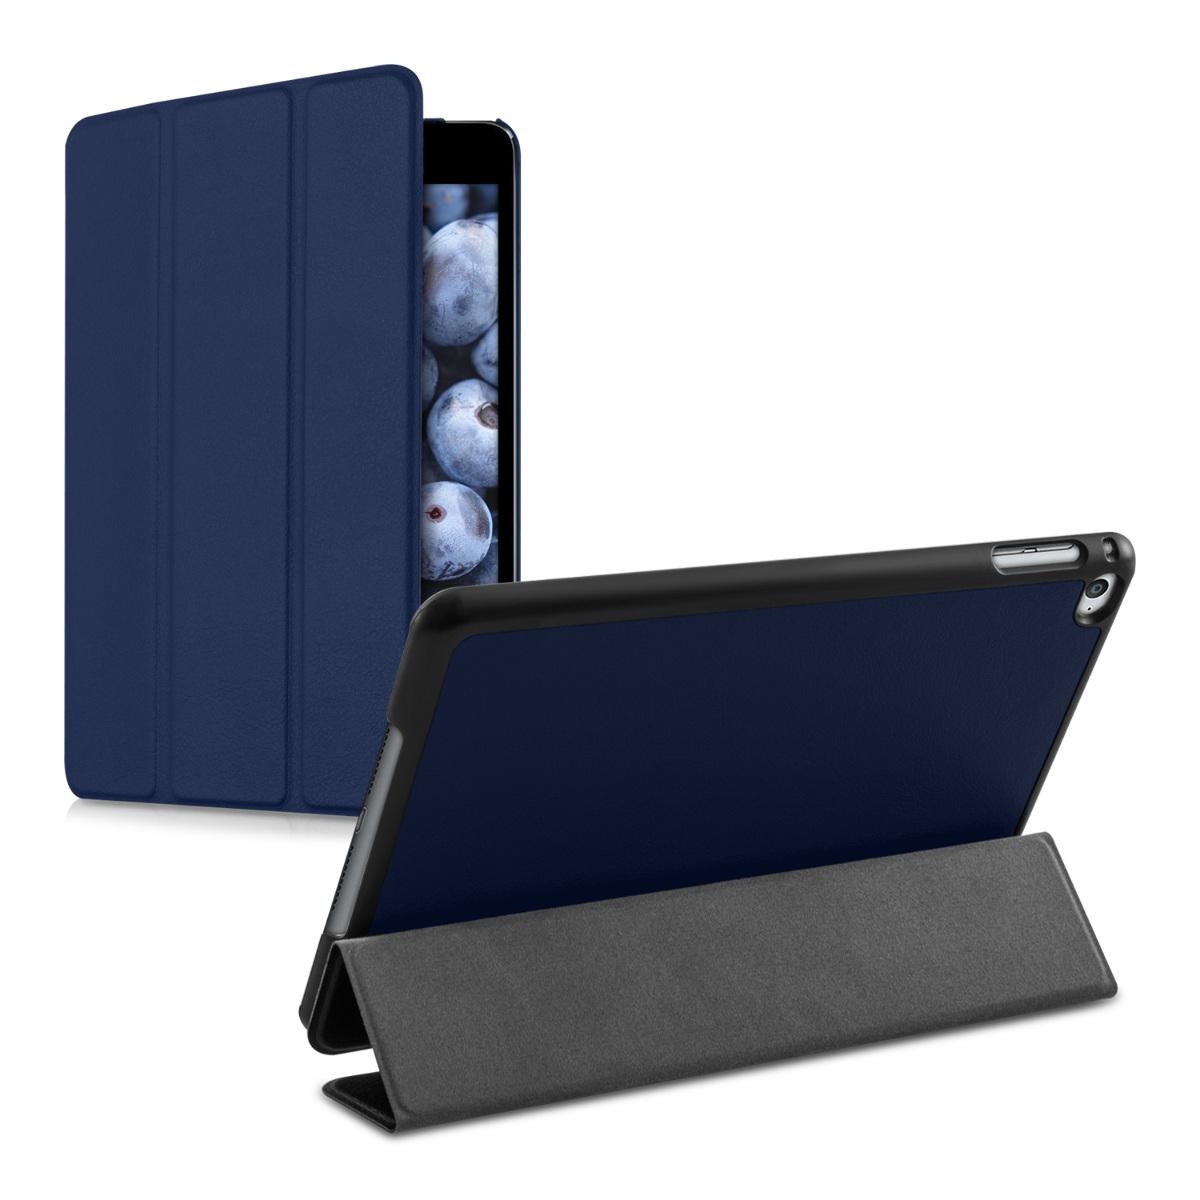 Funda para apple ipad mini 4 carcasa protectora estuche - Funda protectora tablet ...